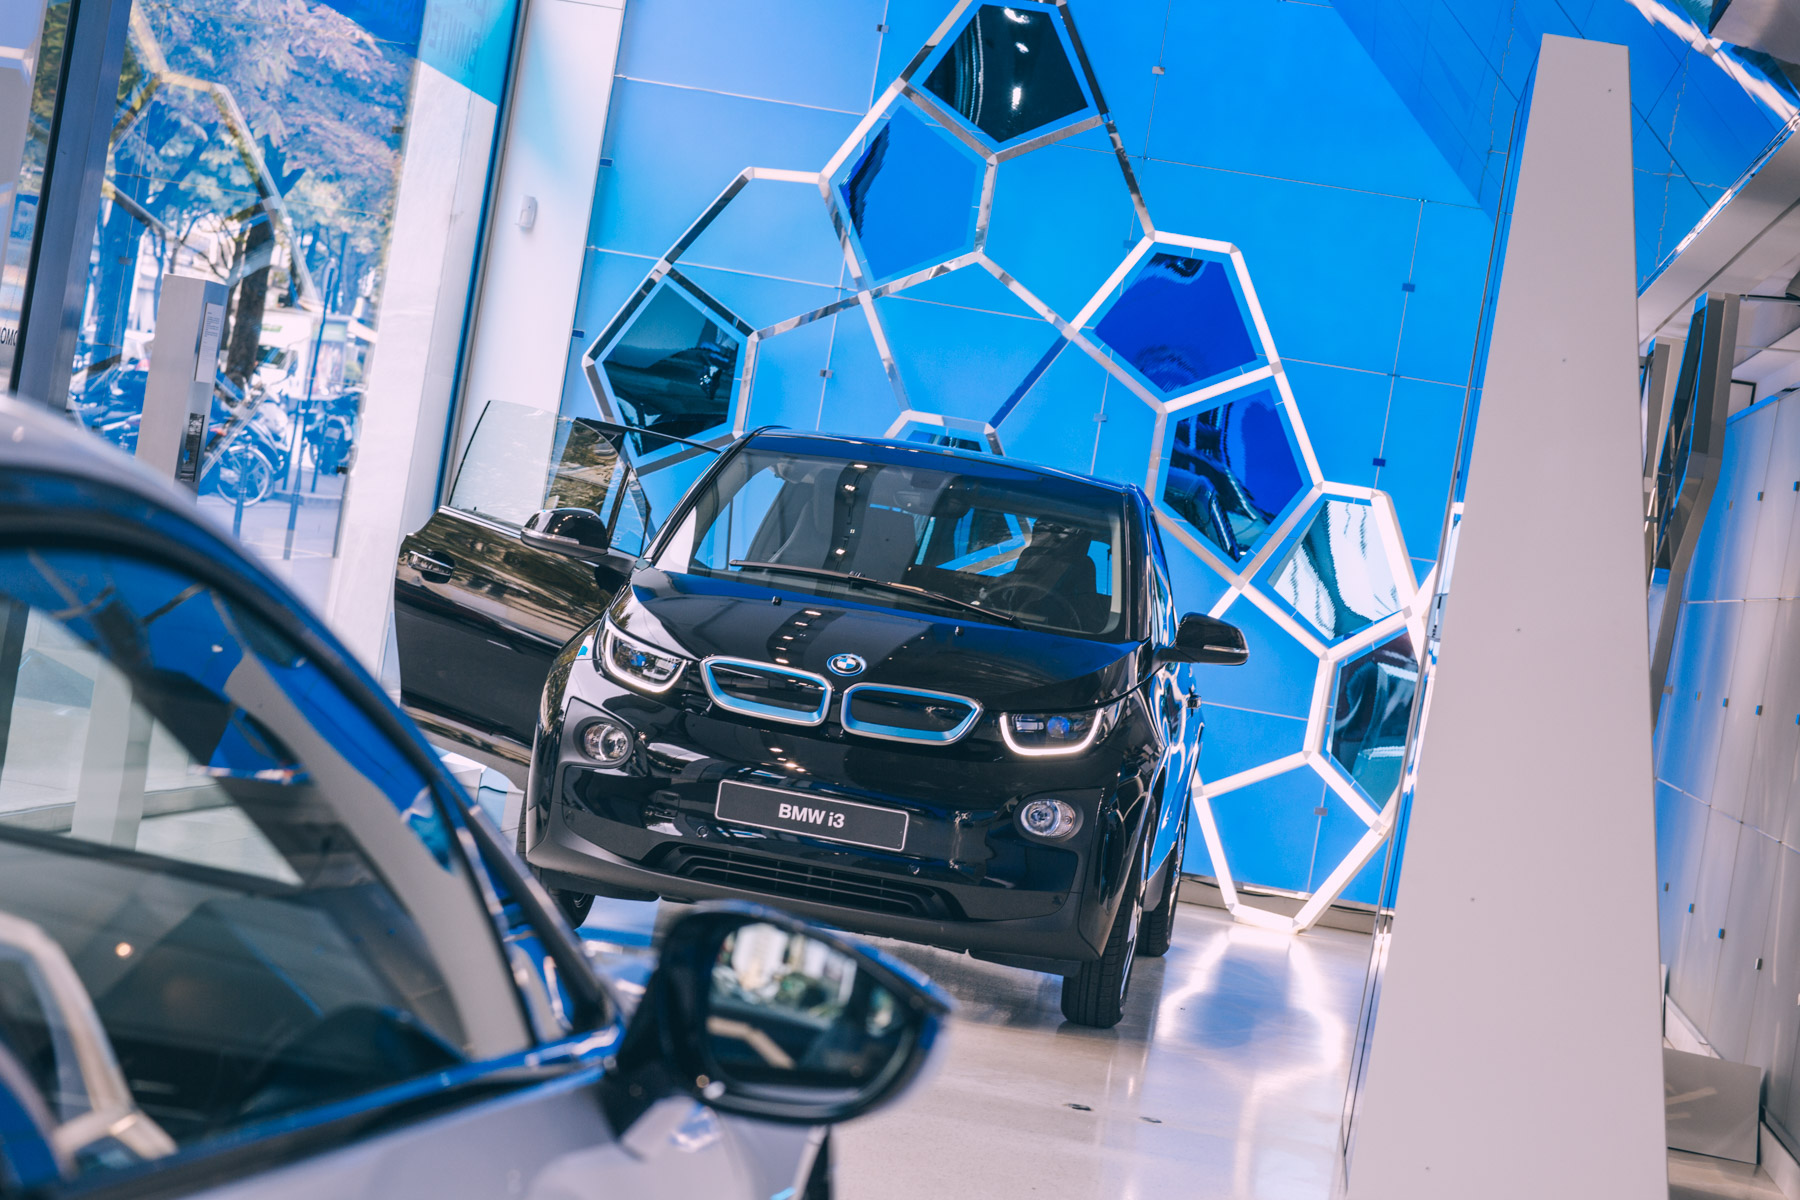 BMW George V EXPERIENCE BMW i ECOSYSYTEM WP74